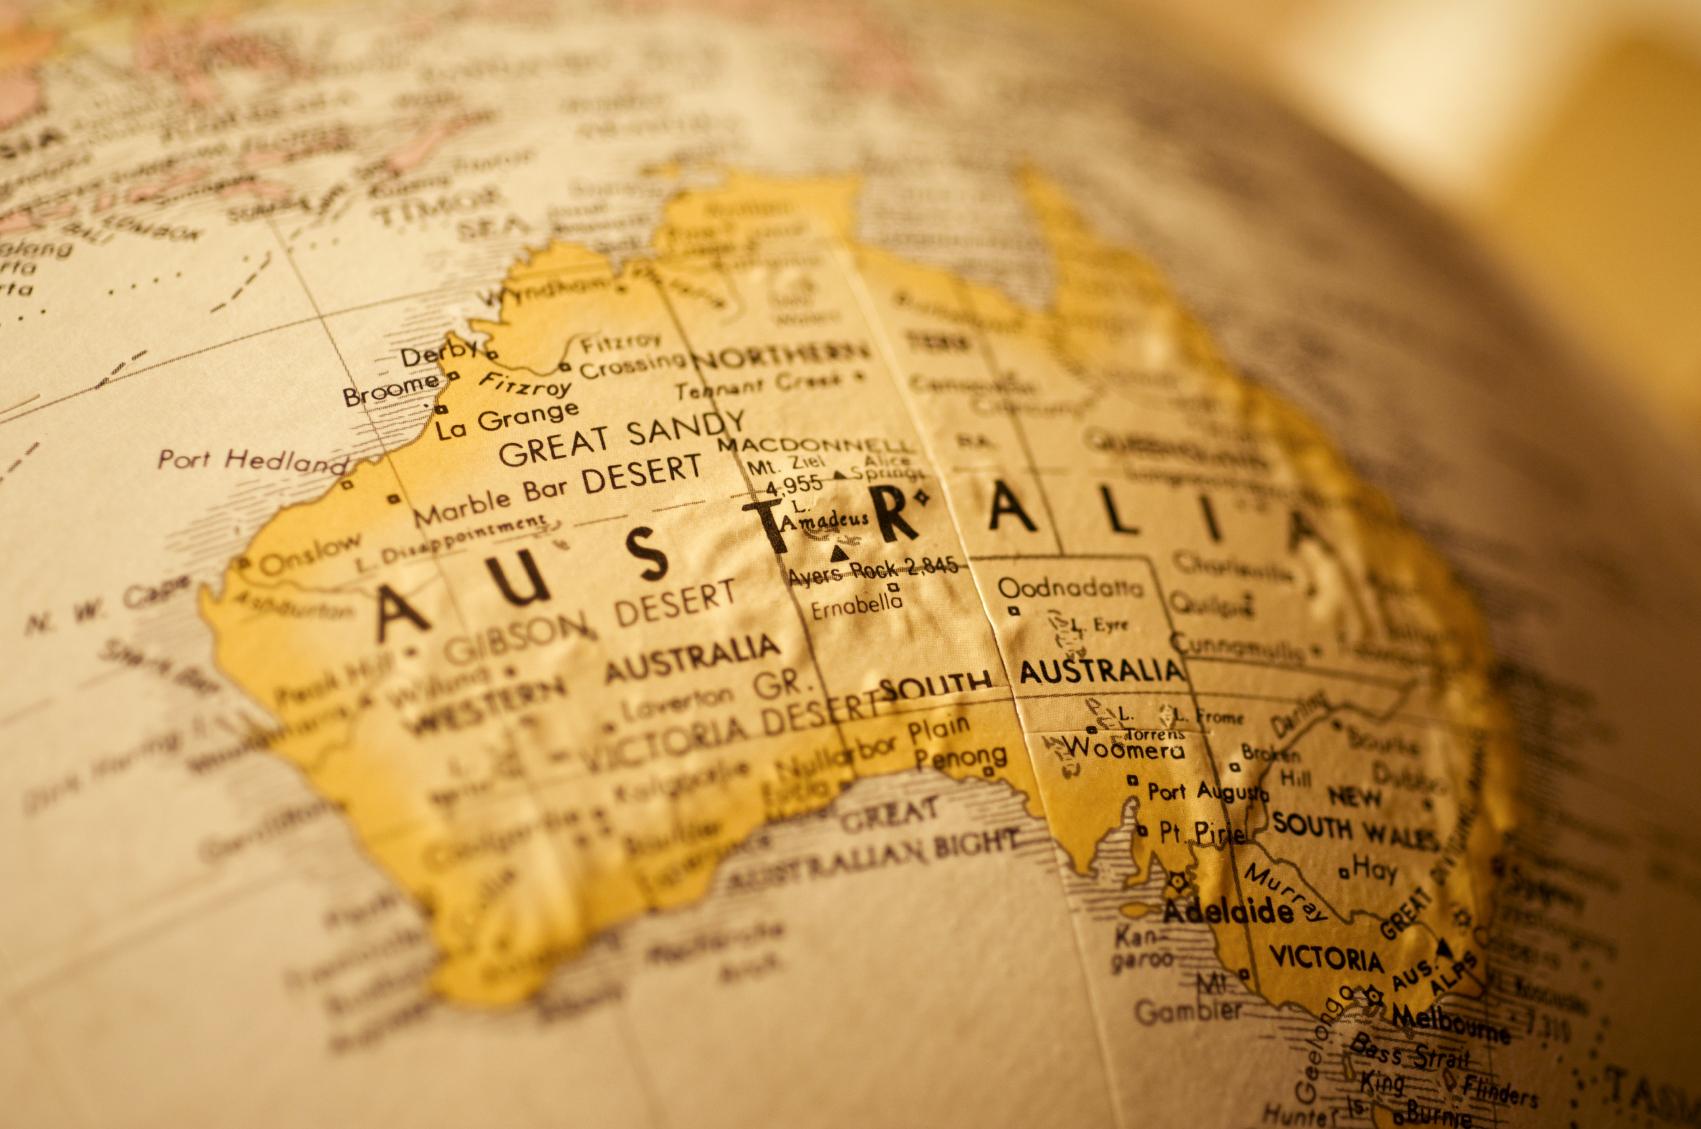 trabajar en australia con visa de turista